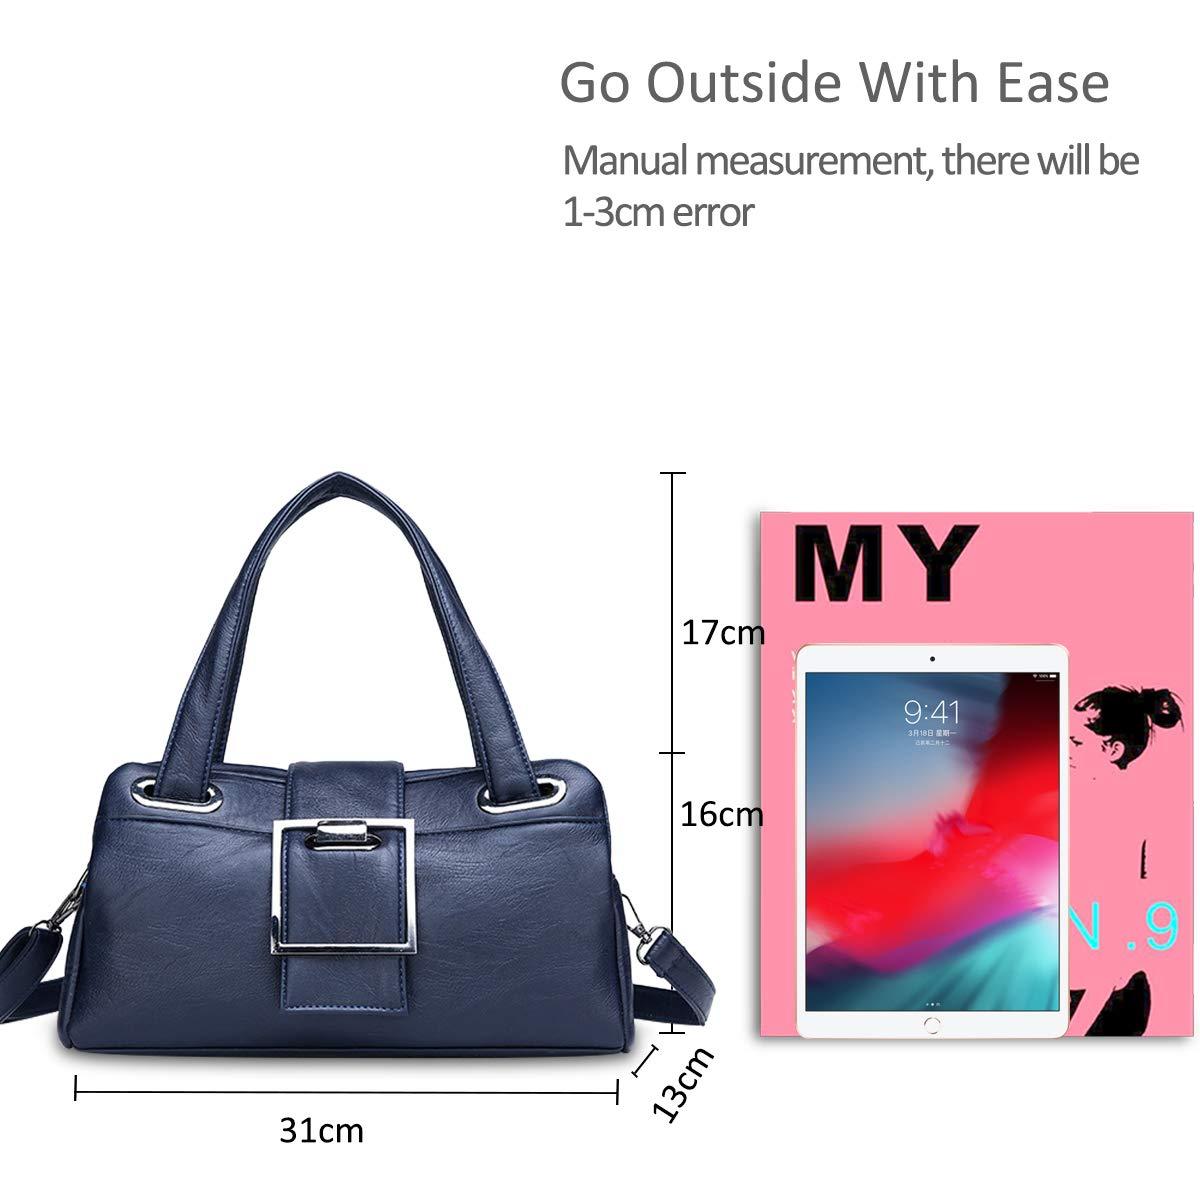 NICOLE /& DORIS Bolsos de Mujer Bolsos Baguette para Damas Bolsos de Bandolera de Moda Bolso de Cuero PU Retro Bolsos de Mujeres Azul Oscuro